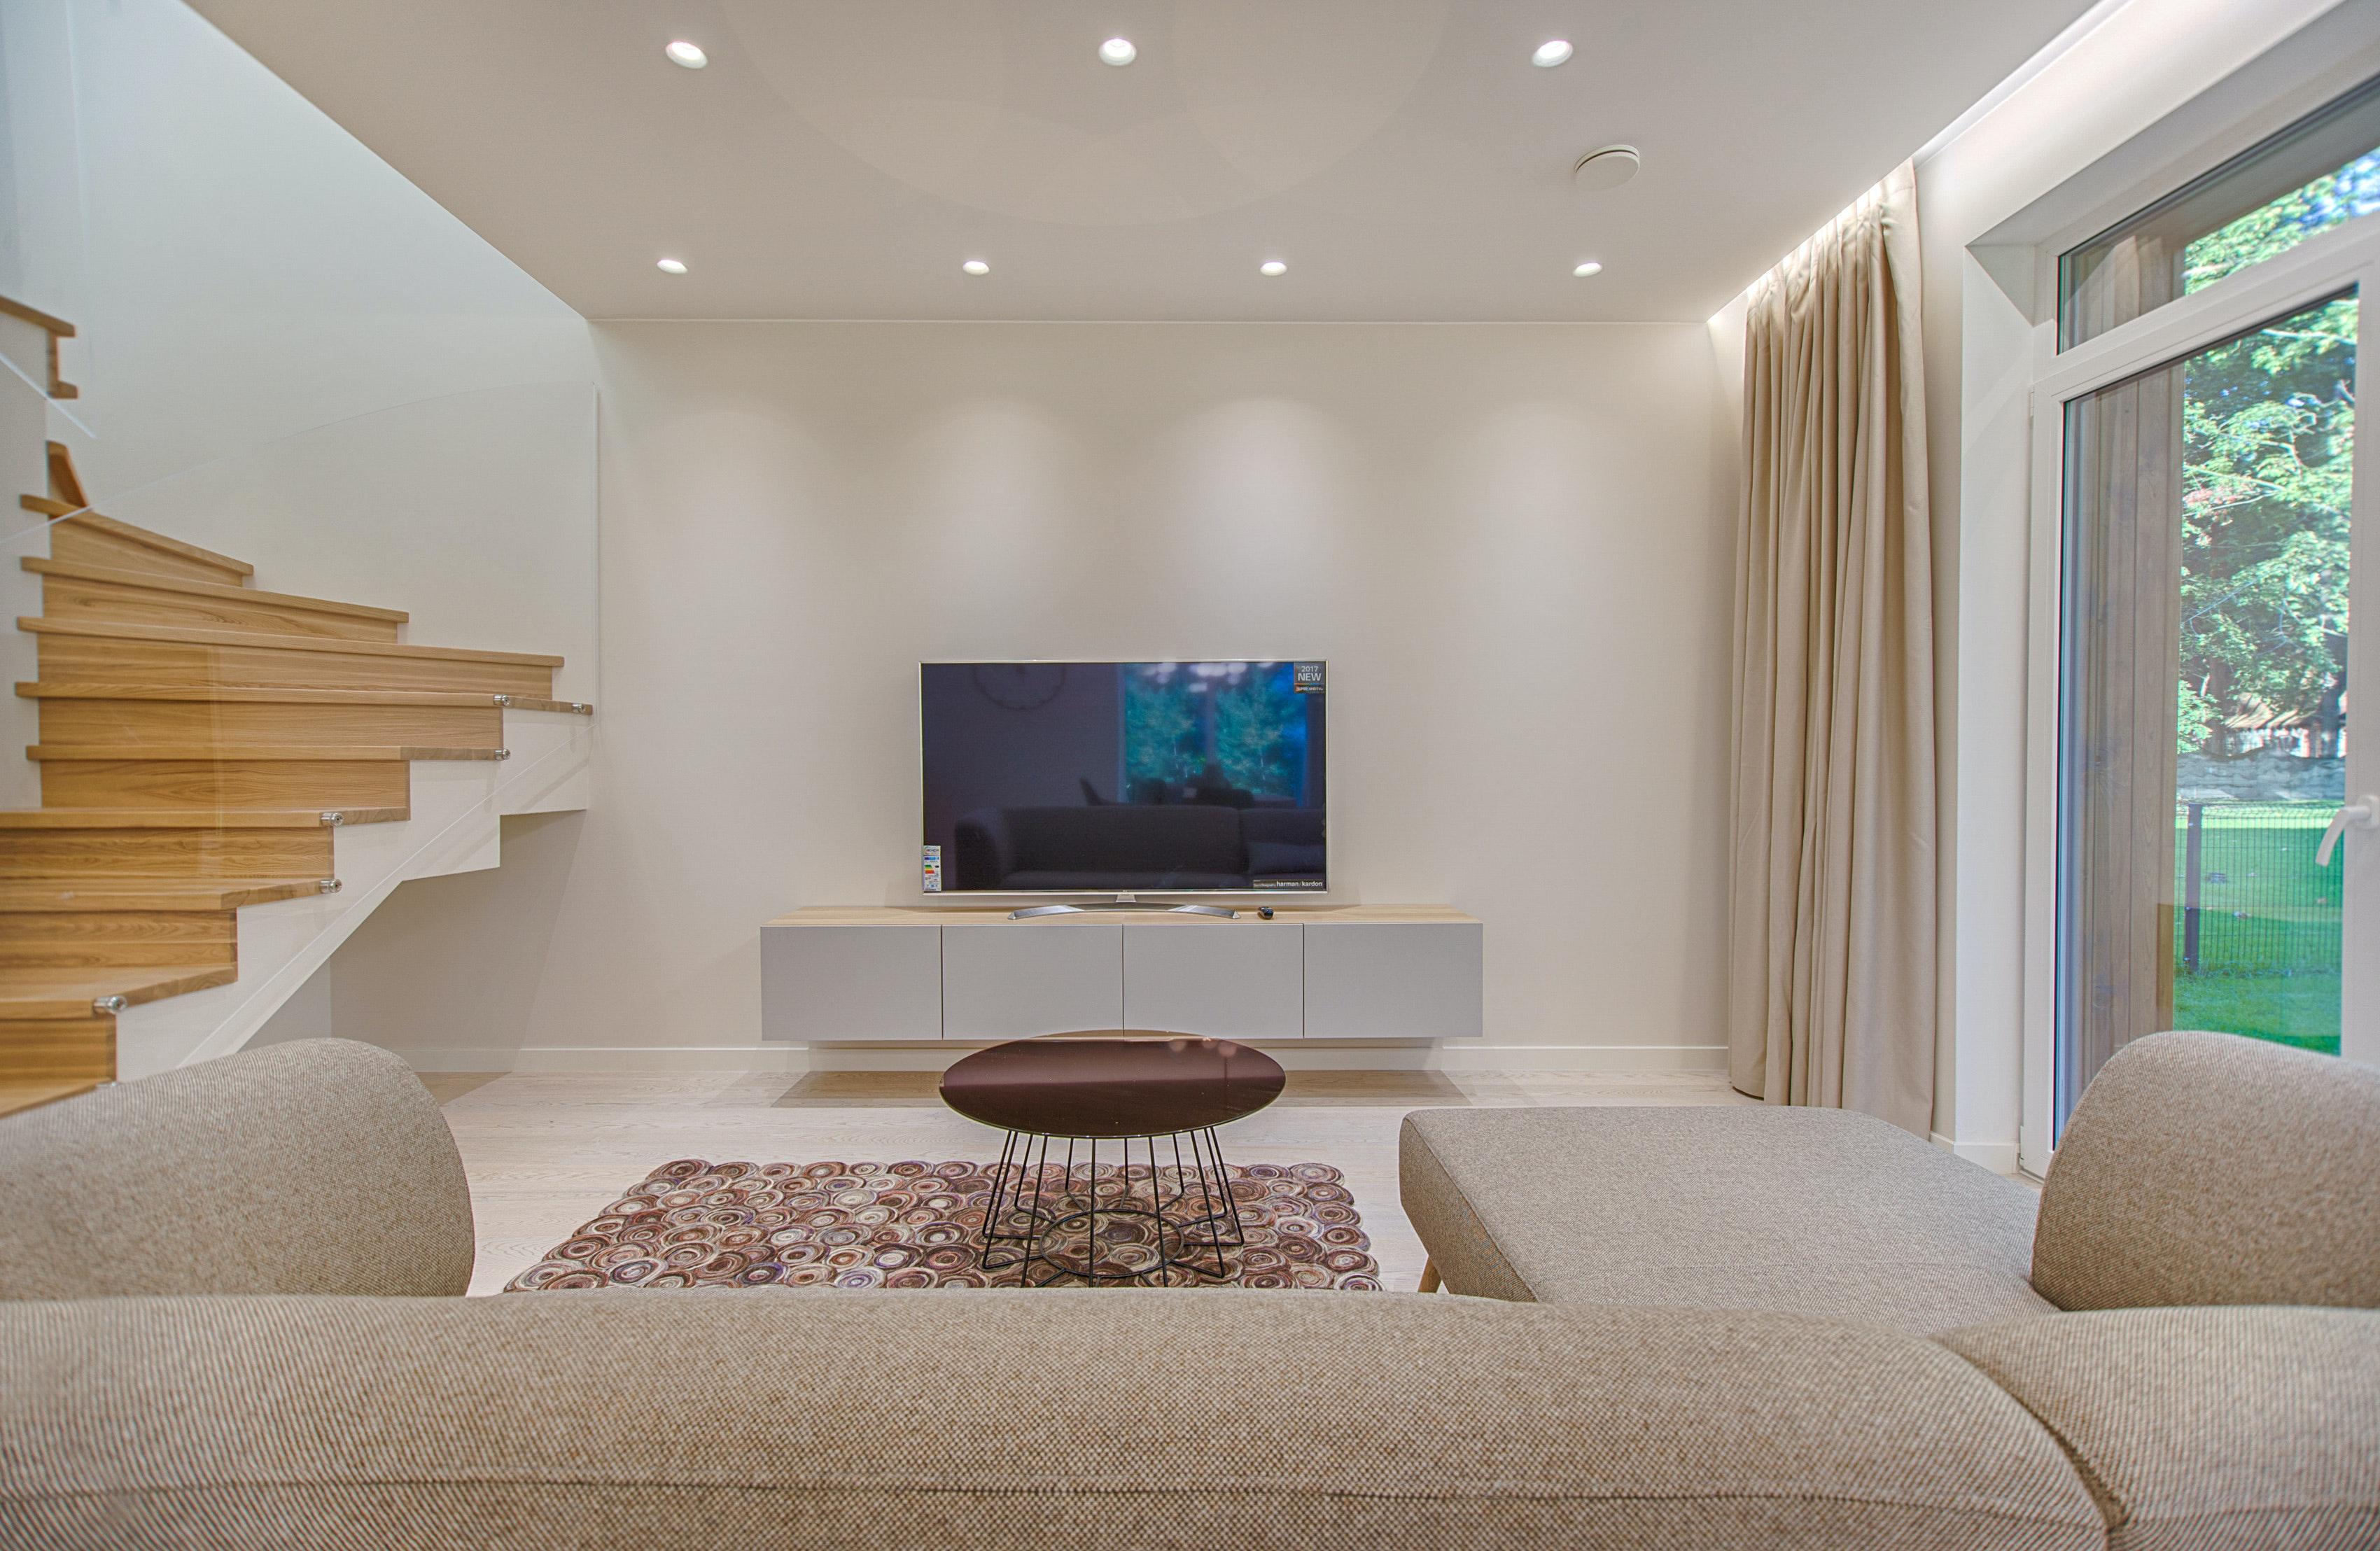 1000 amazing interior photos pexels free stock photos - Interior design for living room photos ...